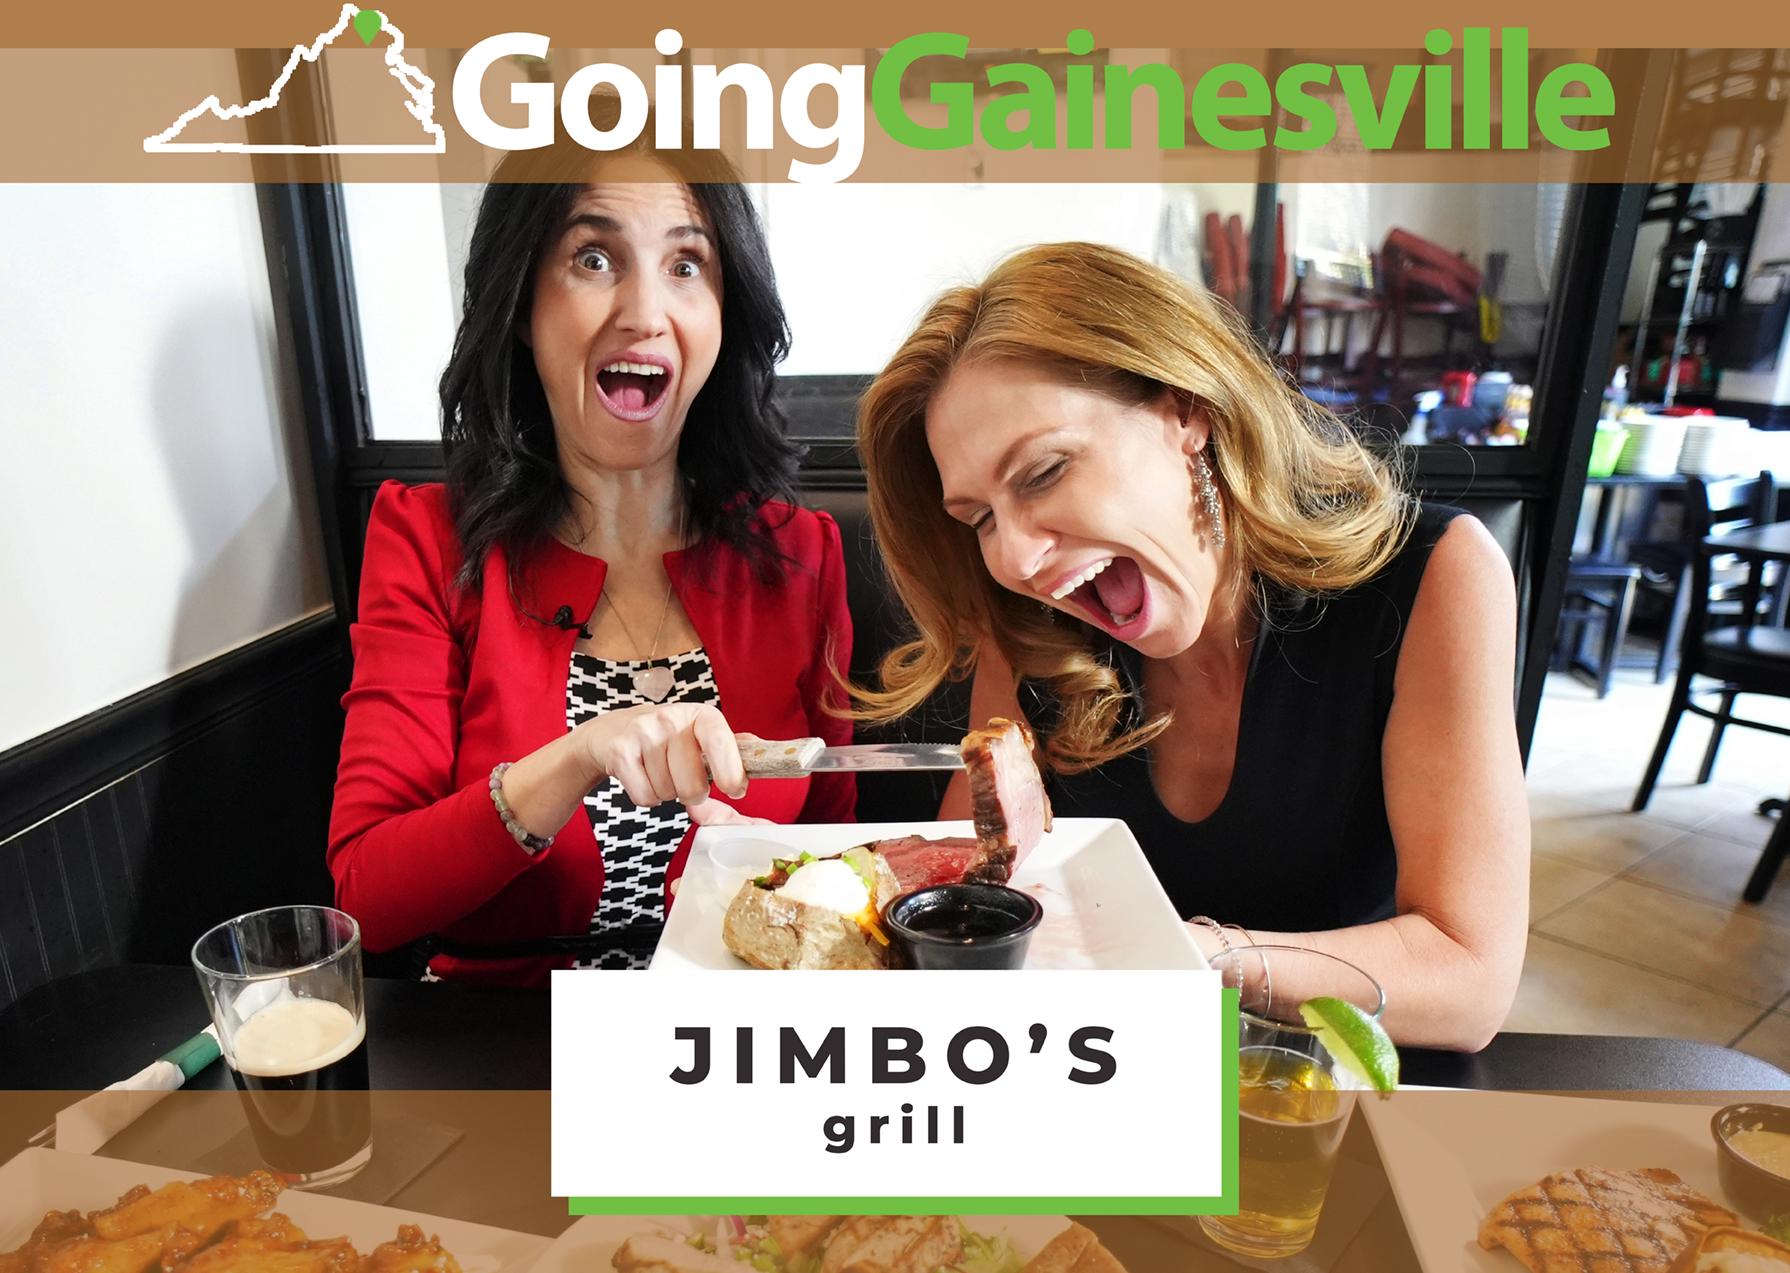 Jimbos Grill & Bar